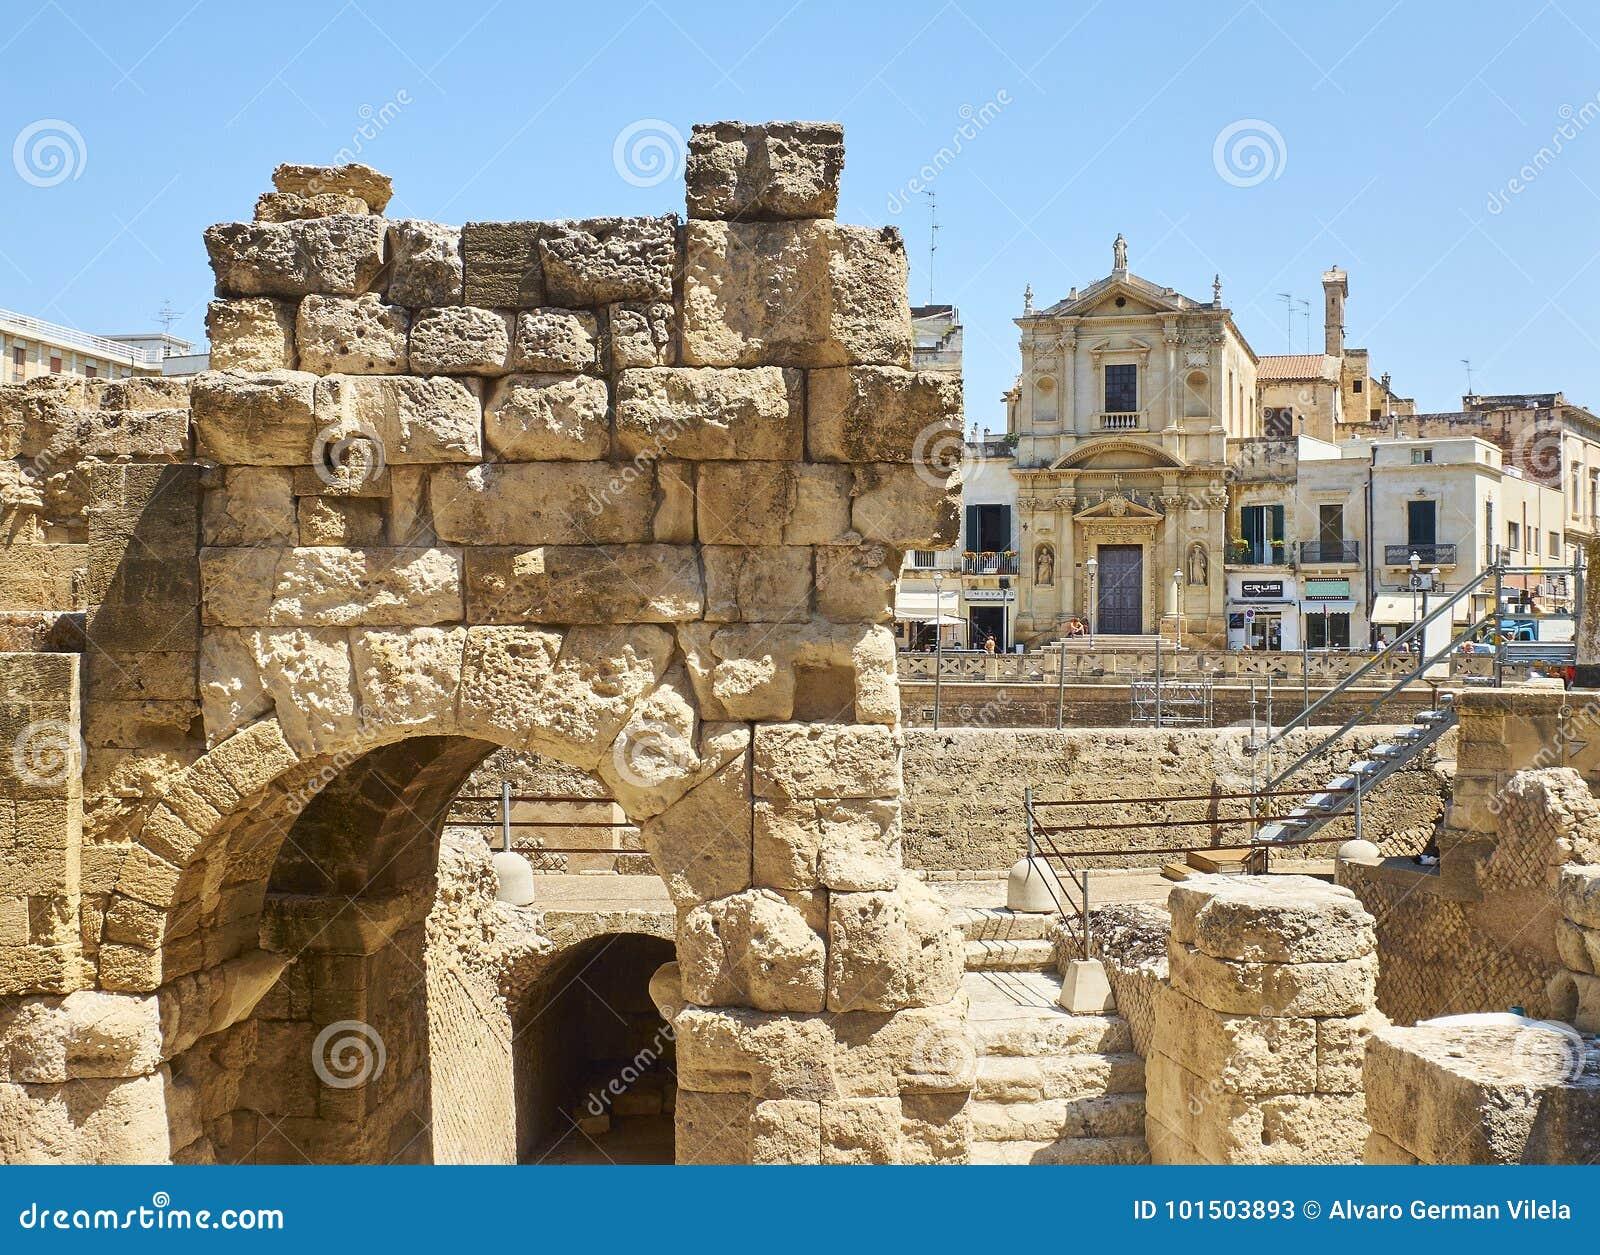 Roman Amphitheatre no quadrado de Santo Oronzo da praça Lecce, Itália